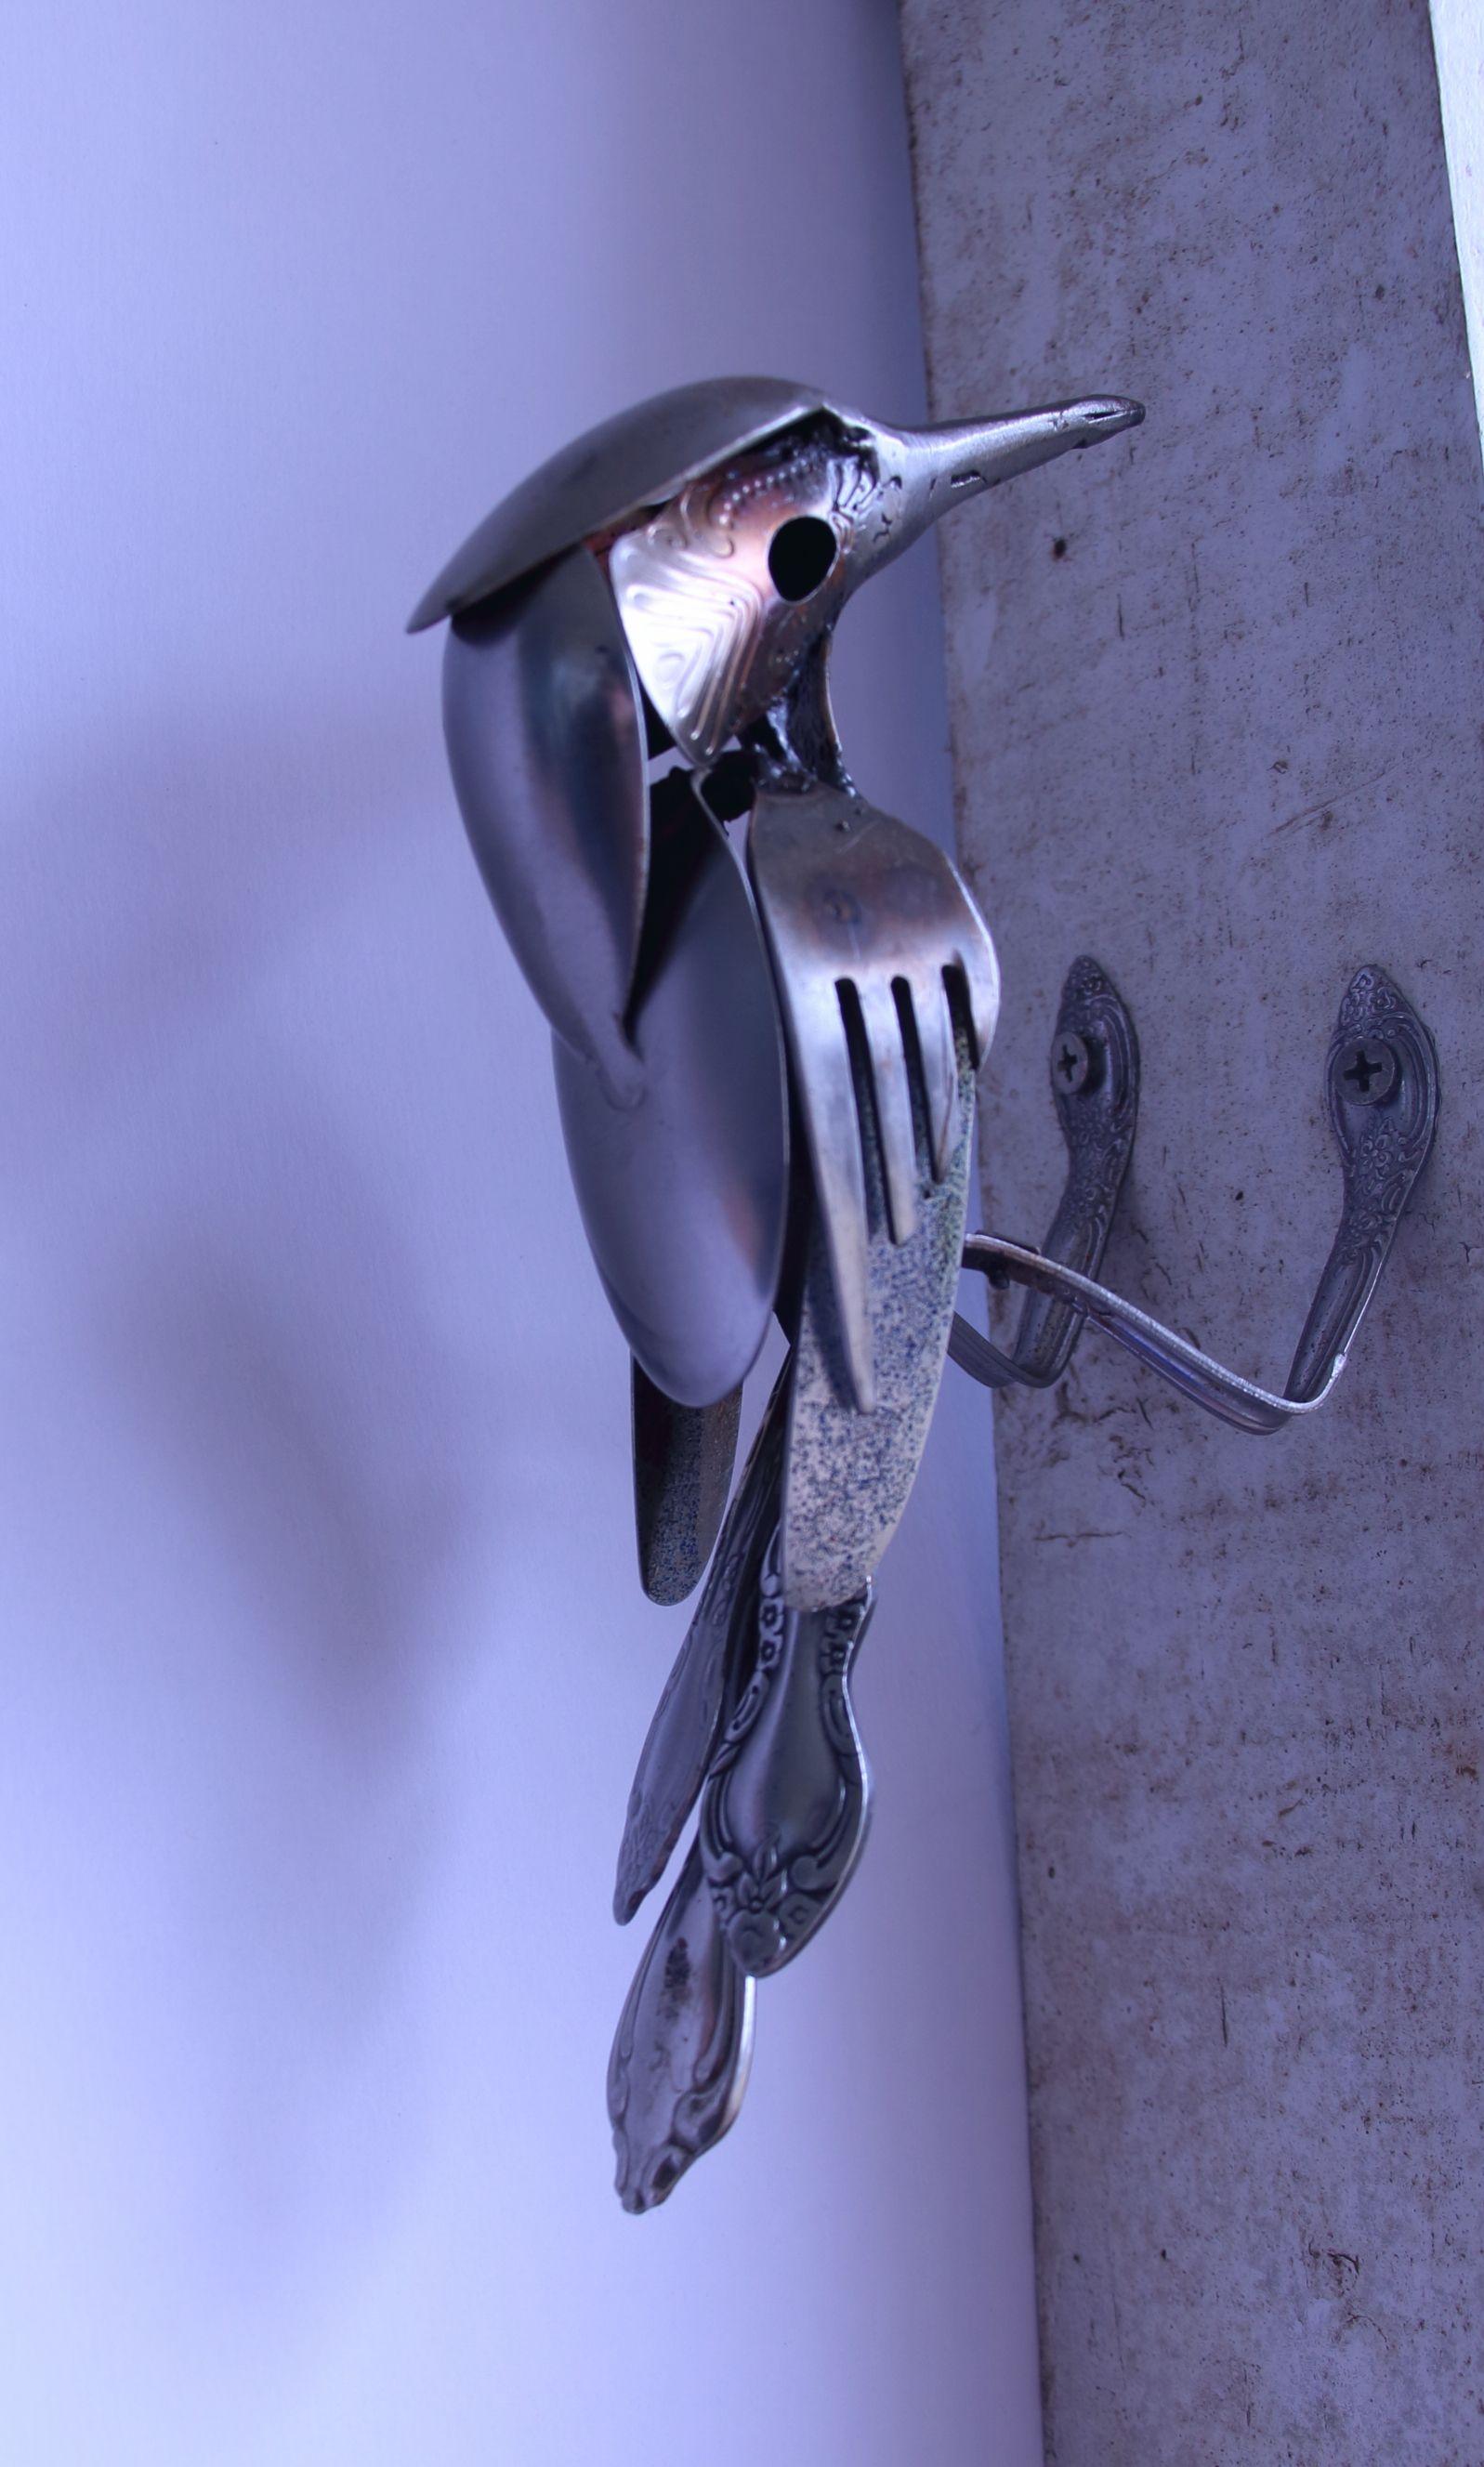 Stainless Steel Bird Created By J R Hamm This Art Sculpture Was Made Using Recycled Scrap M Scrap Metal Art Cutlery Art Metal Art